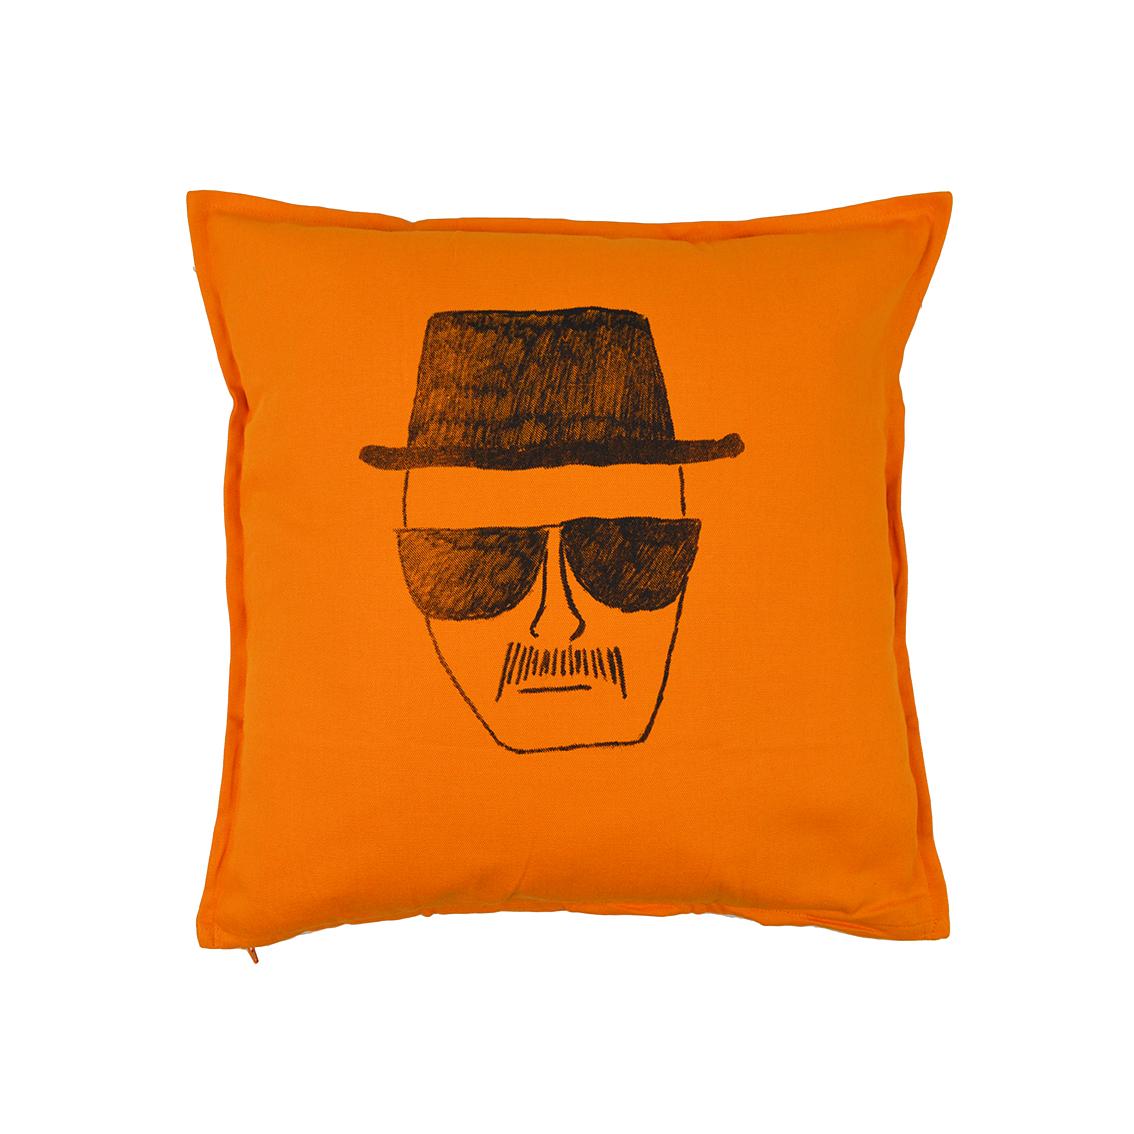 Cuscini Breaking Bad.Identikit Breaking Bad Cuscino 50 50 Arancio Su Faces Tshirt Store